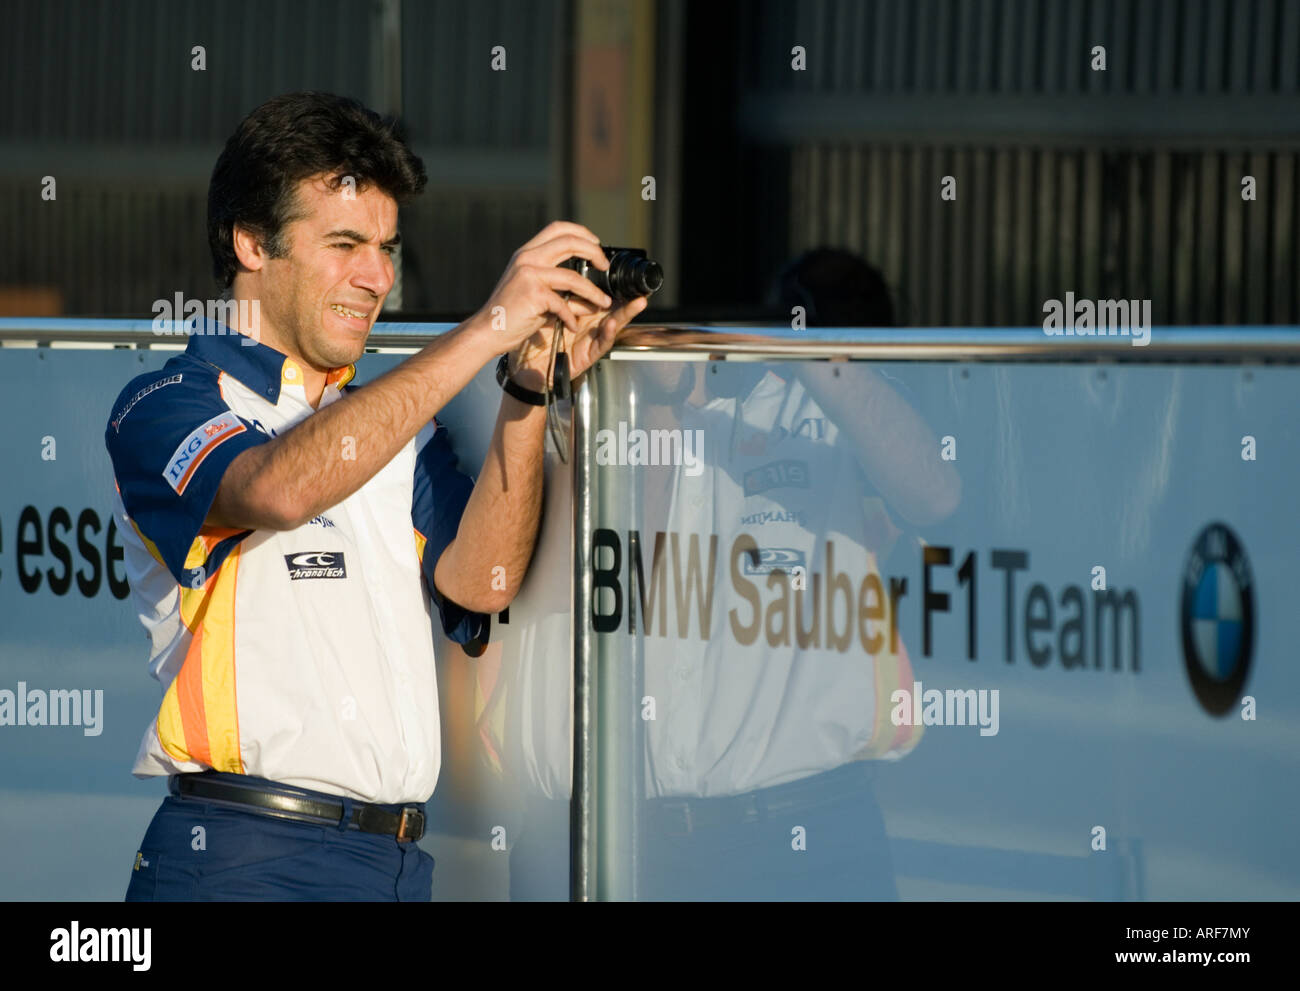 Renault Team member takes pictures of BMW Sauber box during Formula 1 Testing on Circuit Ricardo Tormo, Jan.2008 Stock Photo